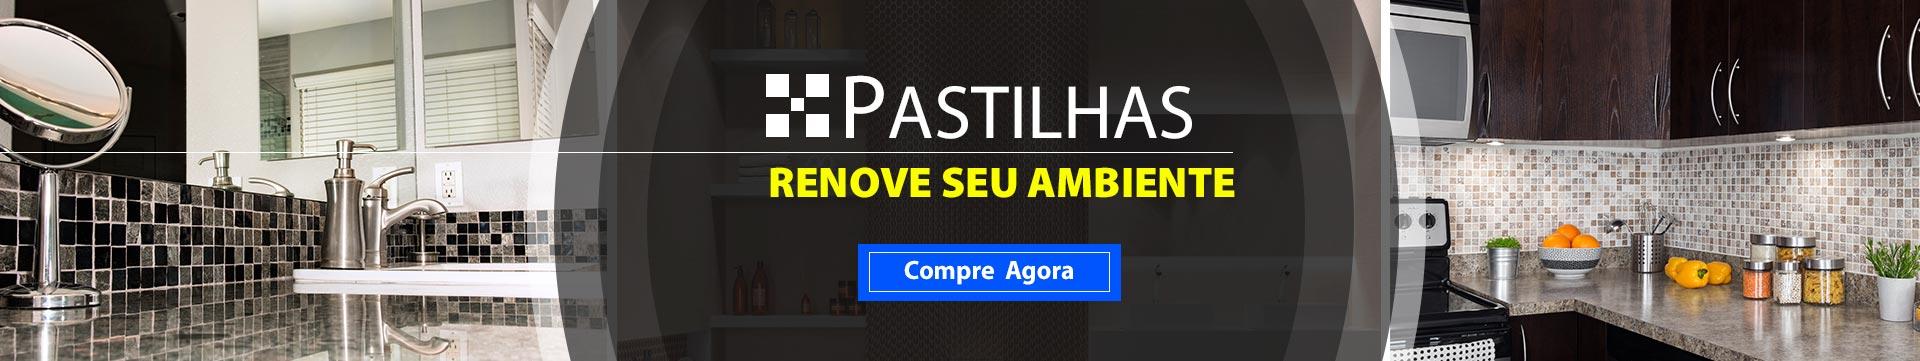 Banner - Pastilhas